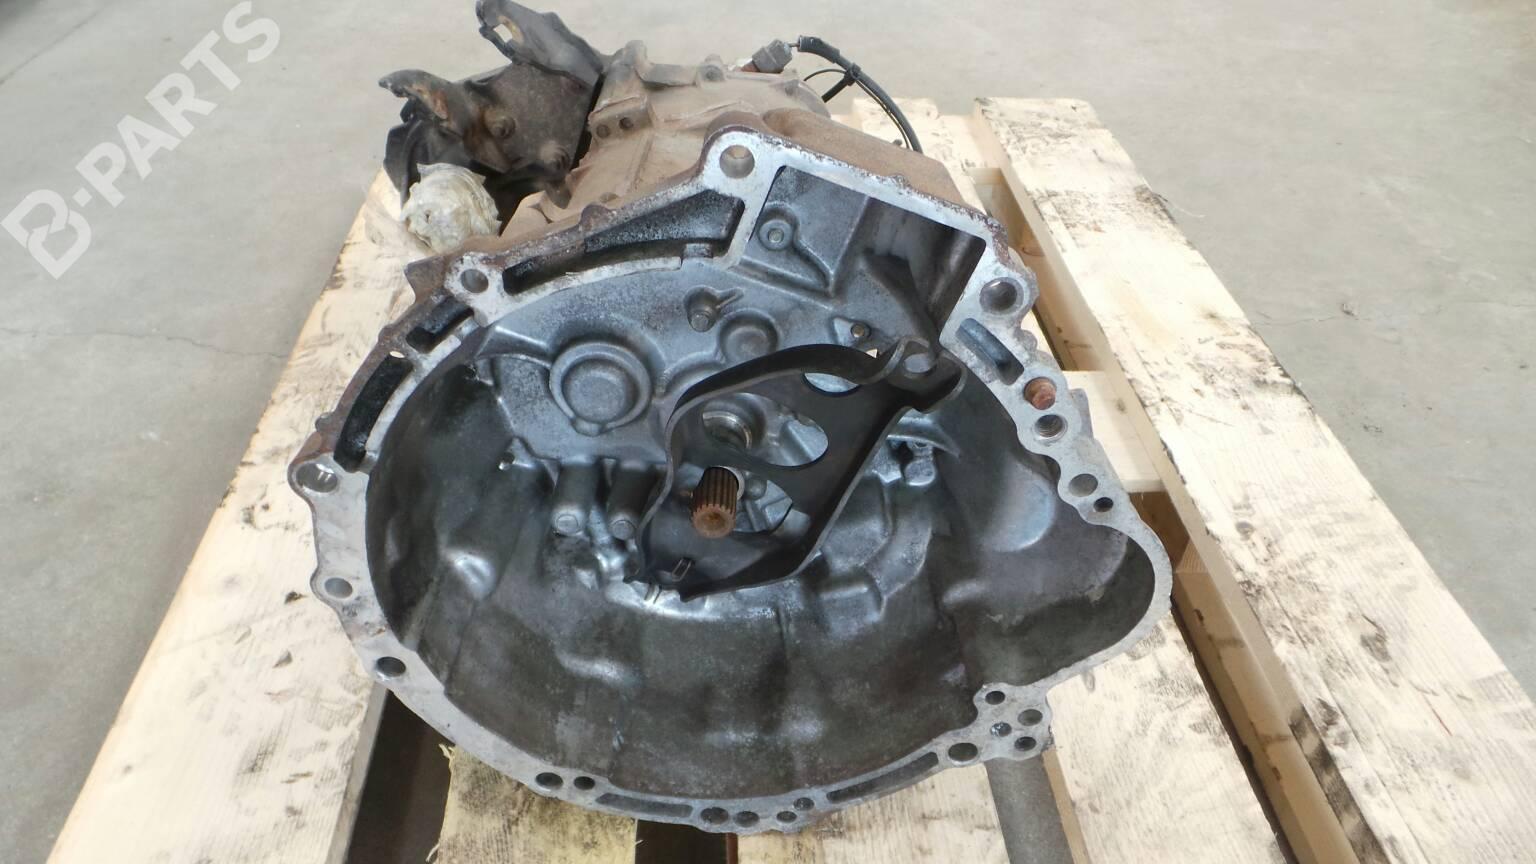 hight resolution of manual gearbox daihatsu terios j1 1 3 4wd j100 83hp